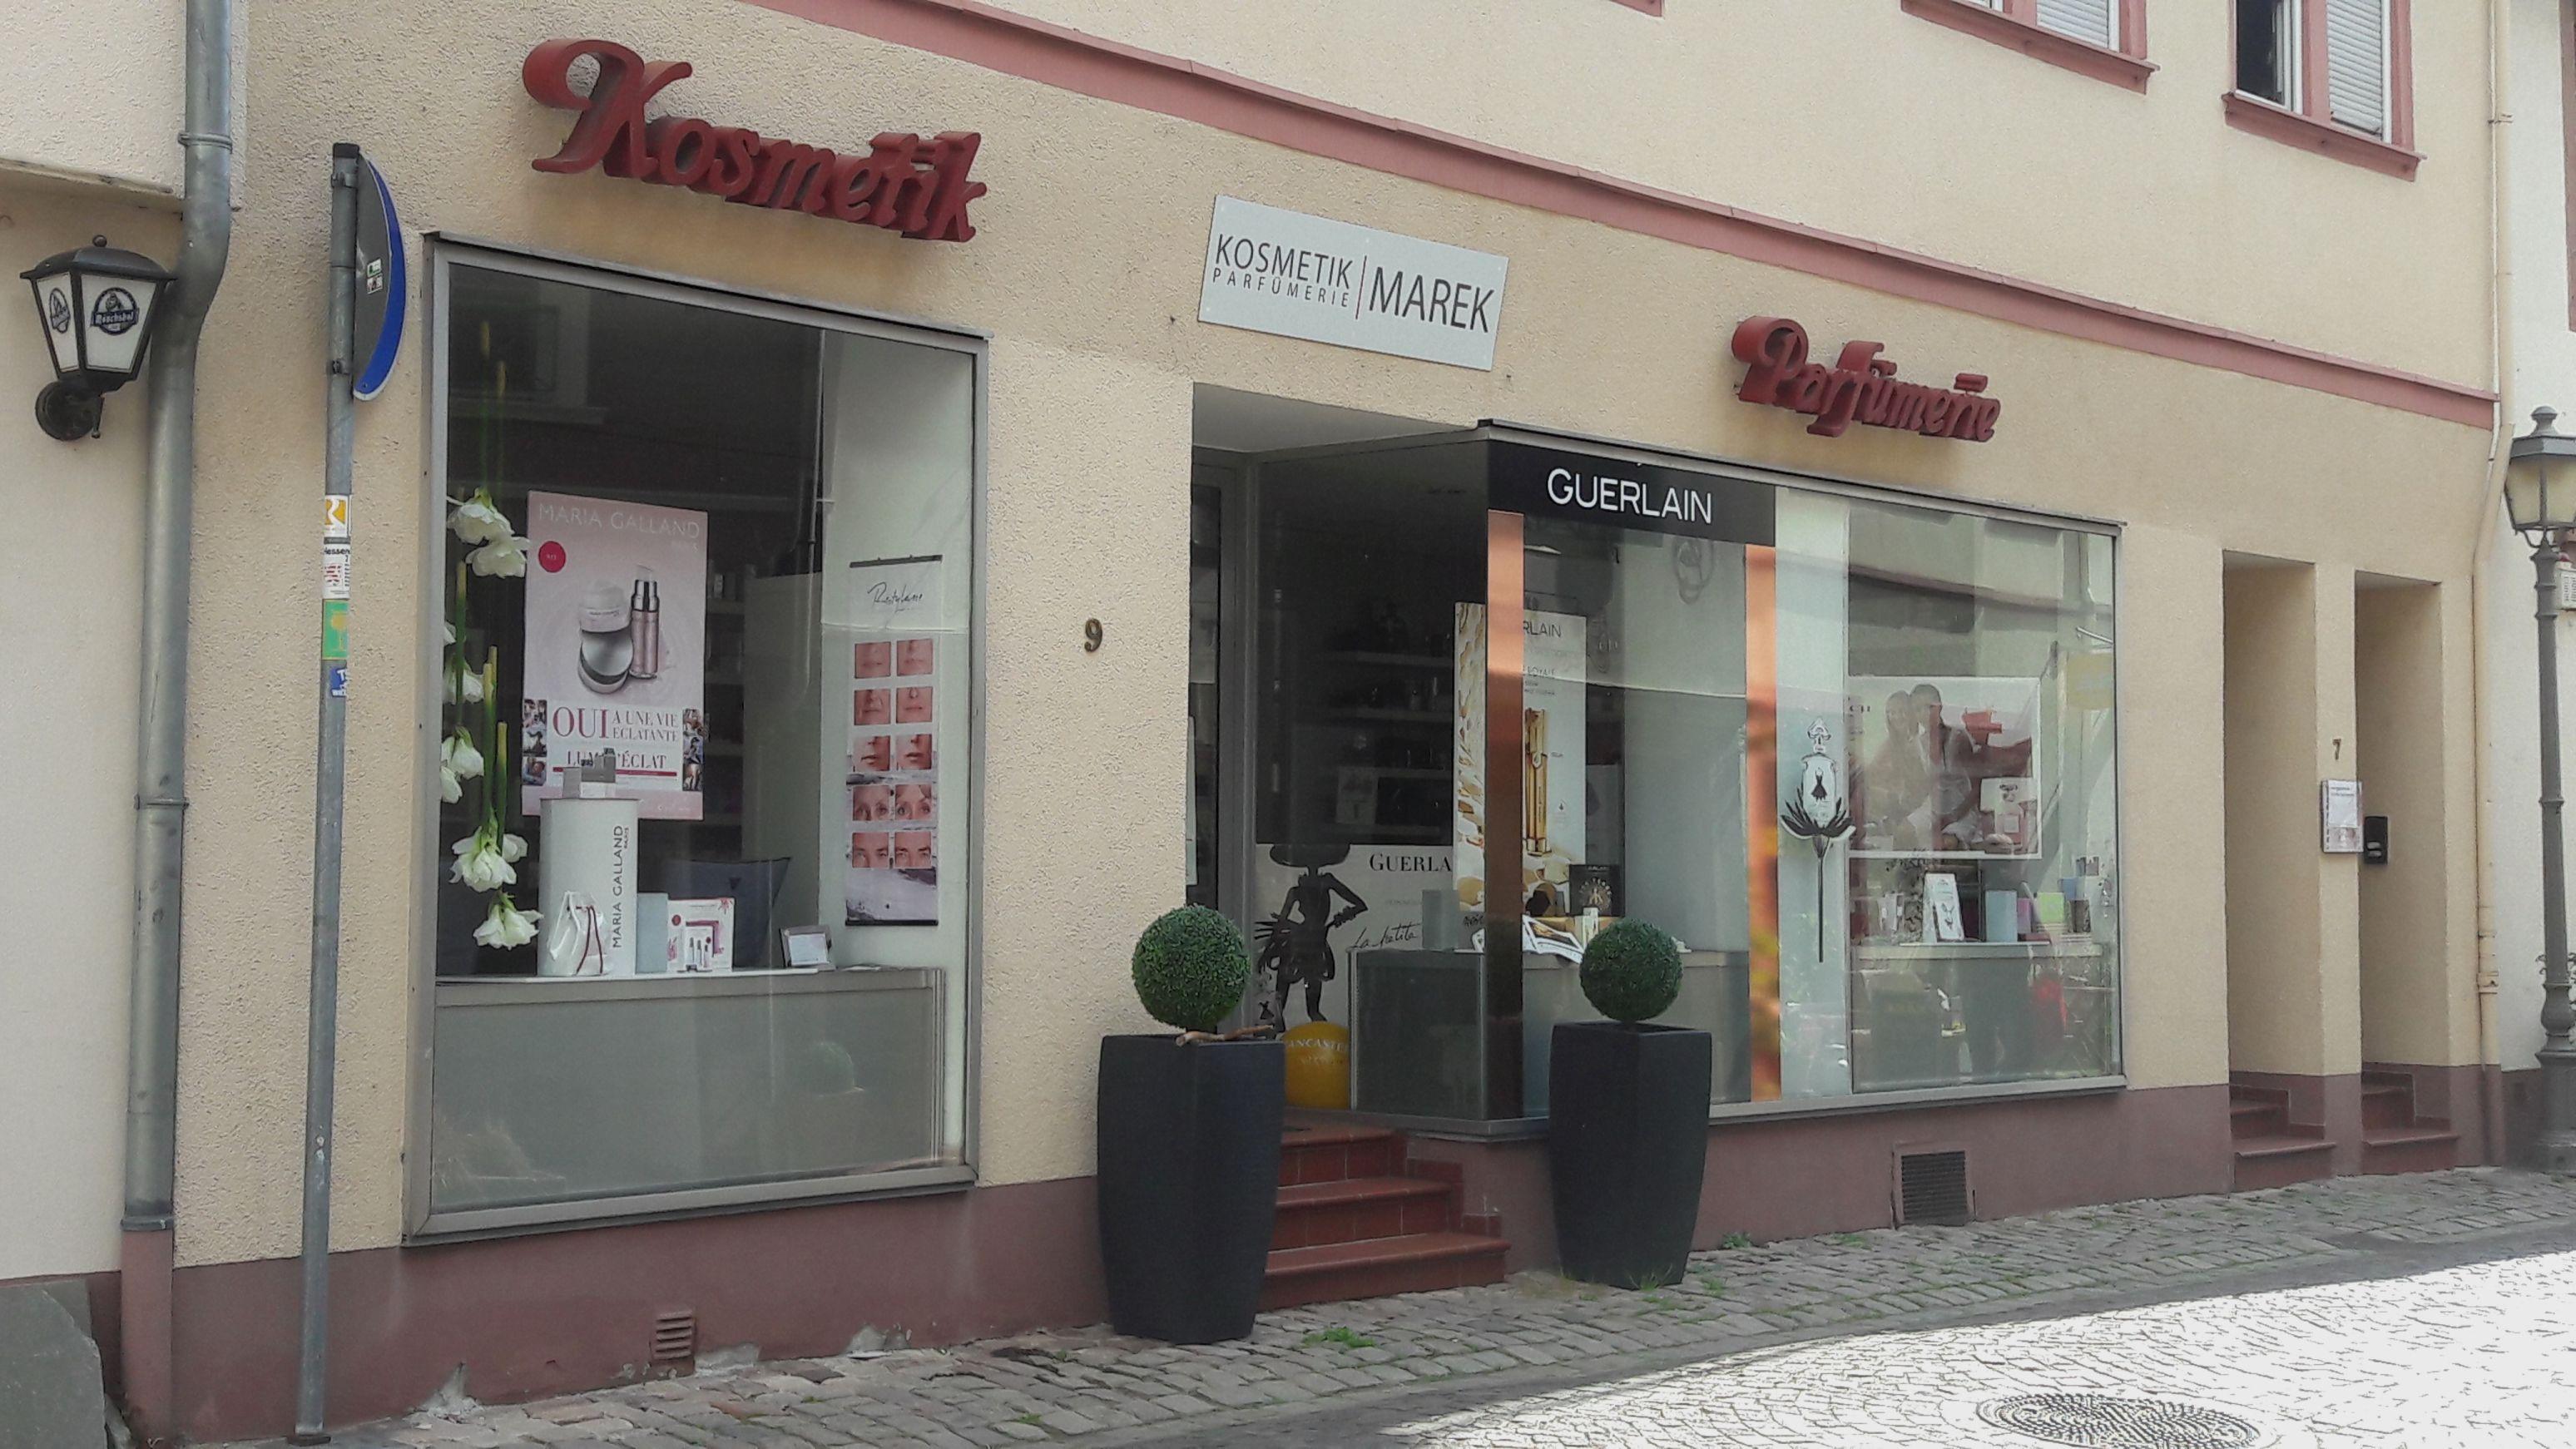 Kosmetik Parfümerie Ilka Marek